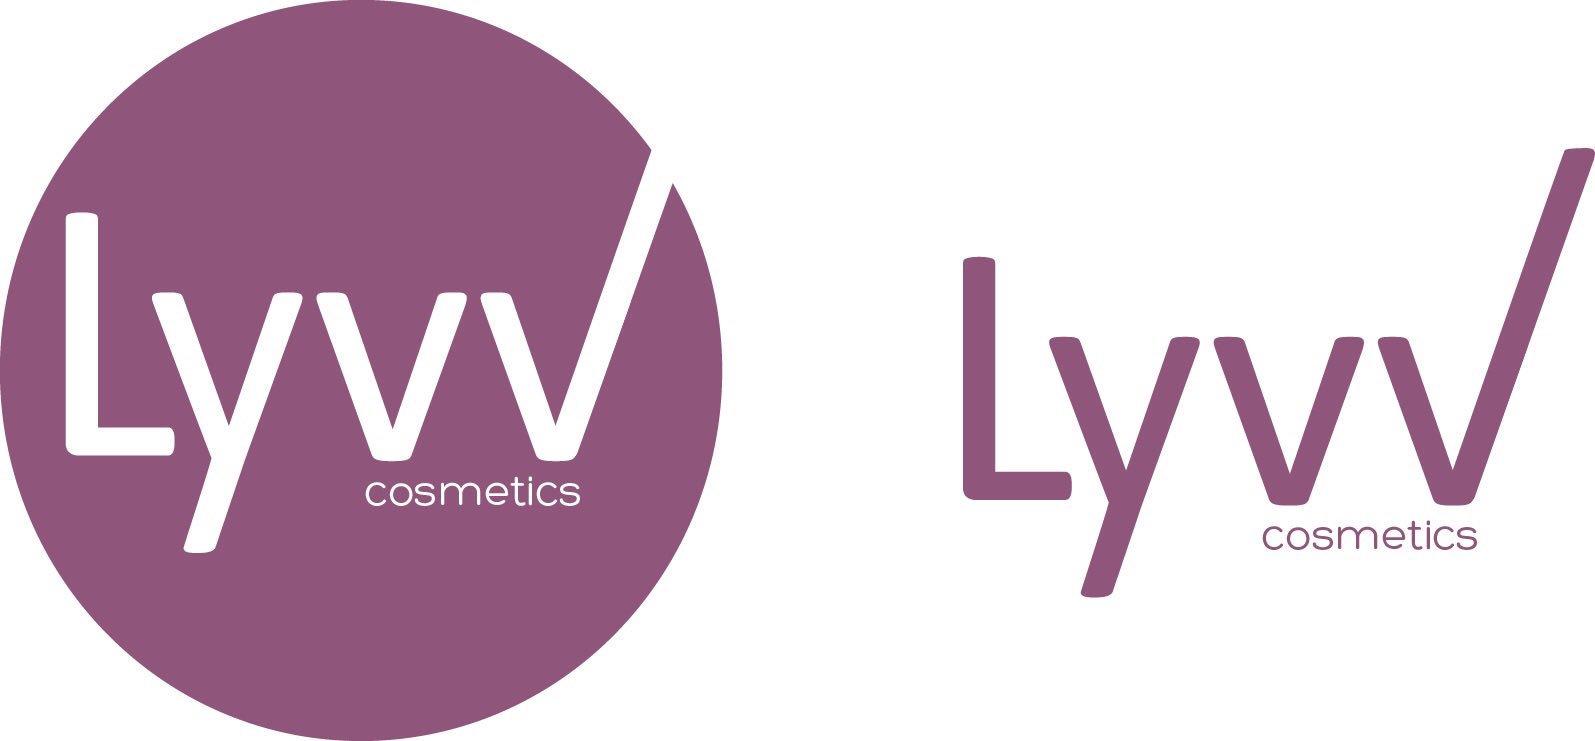 Lyvv Cosmetics